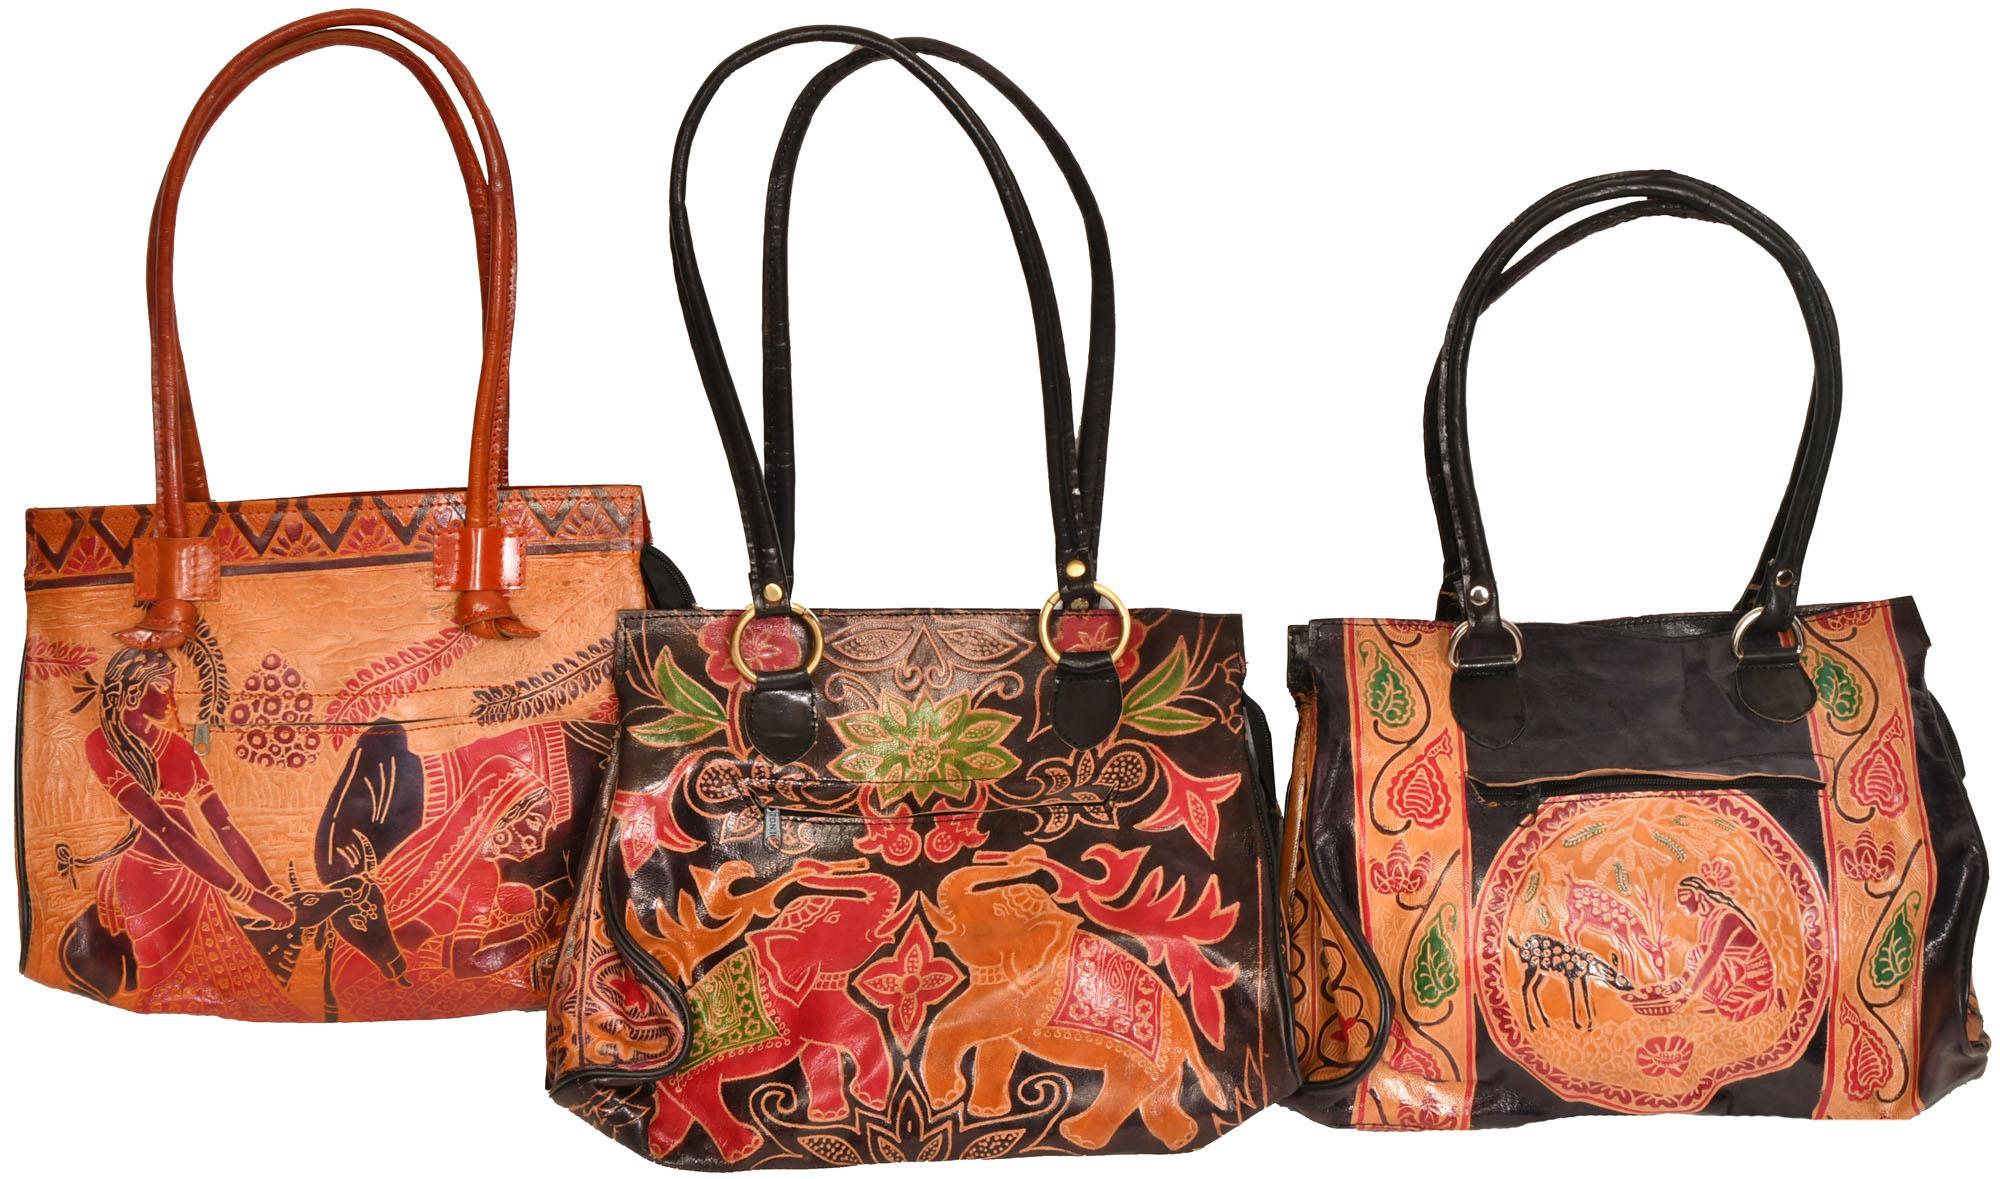 Фото сумок из Индии